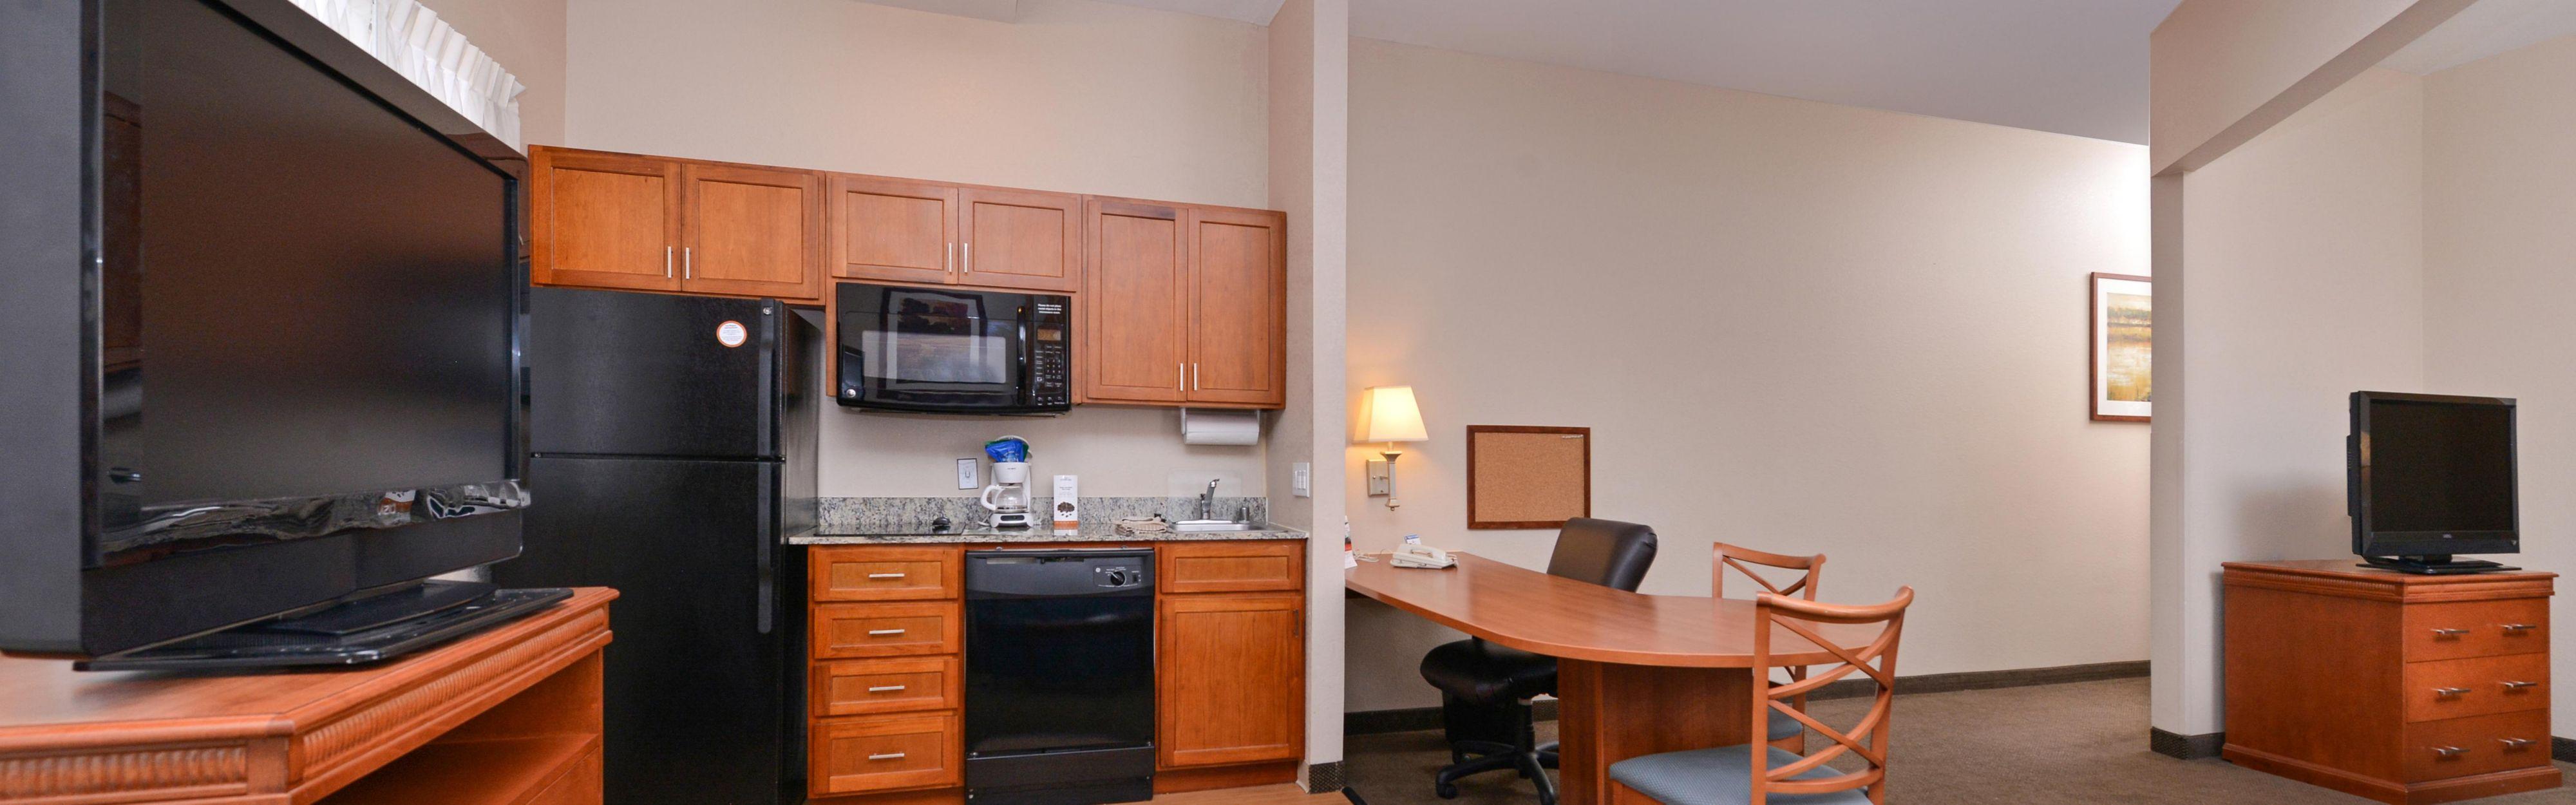 Candlewood Suites San Diego image 1